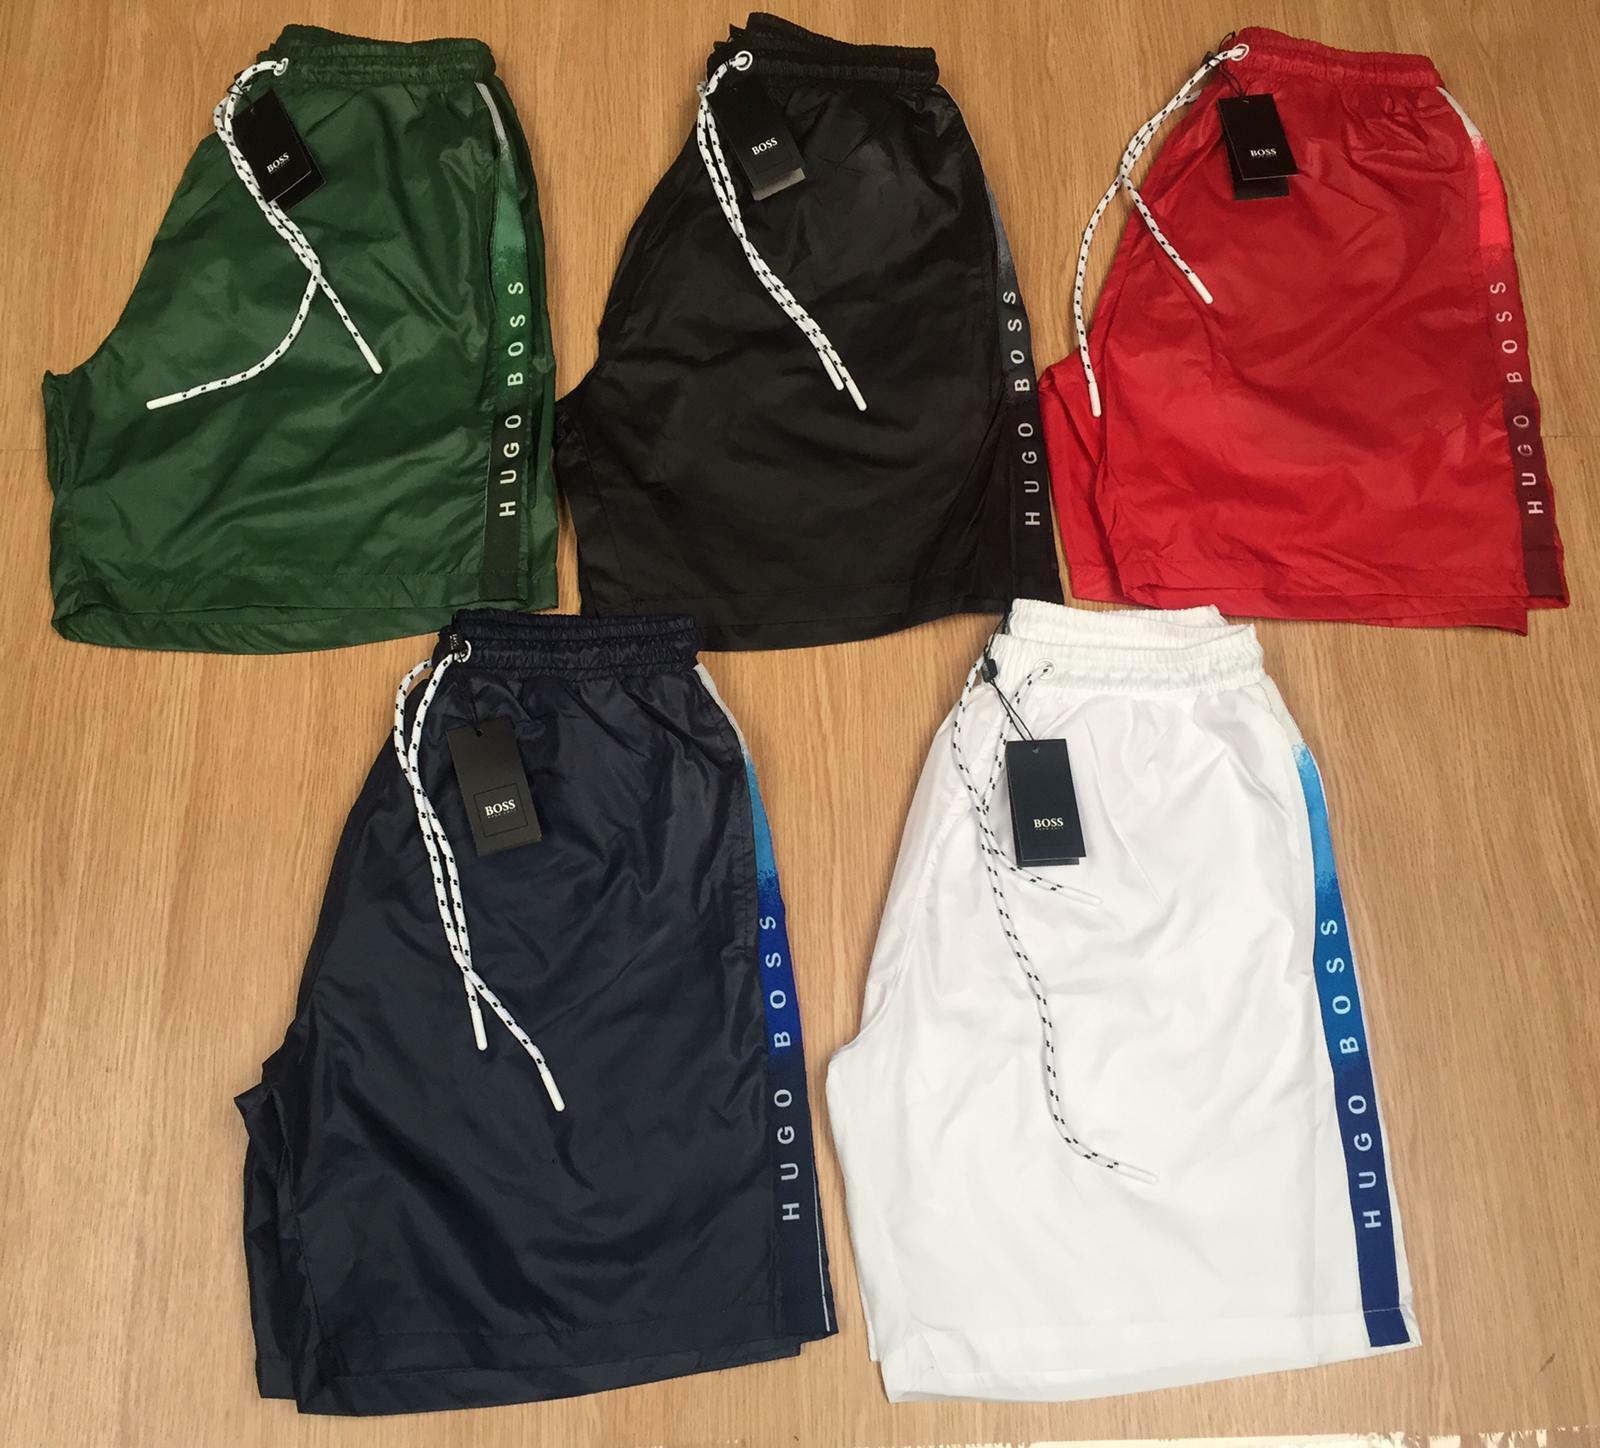 BNWT Hugo Boss Seabream Men's Swim Shorts, S, M, L, XL, 2XL and 3XL.